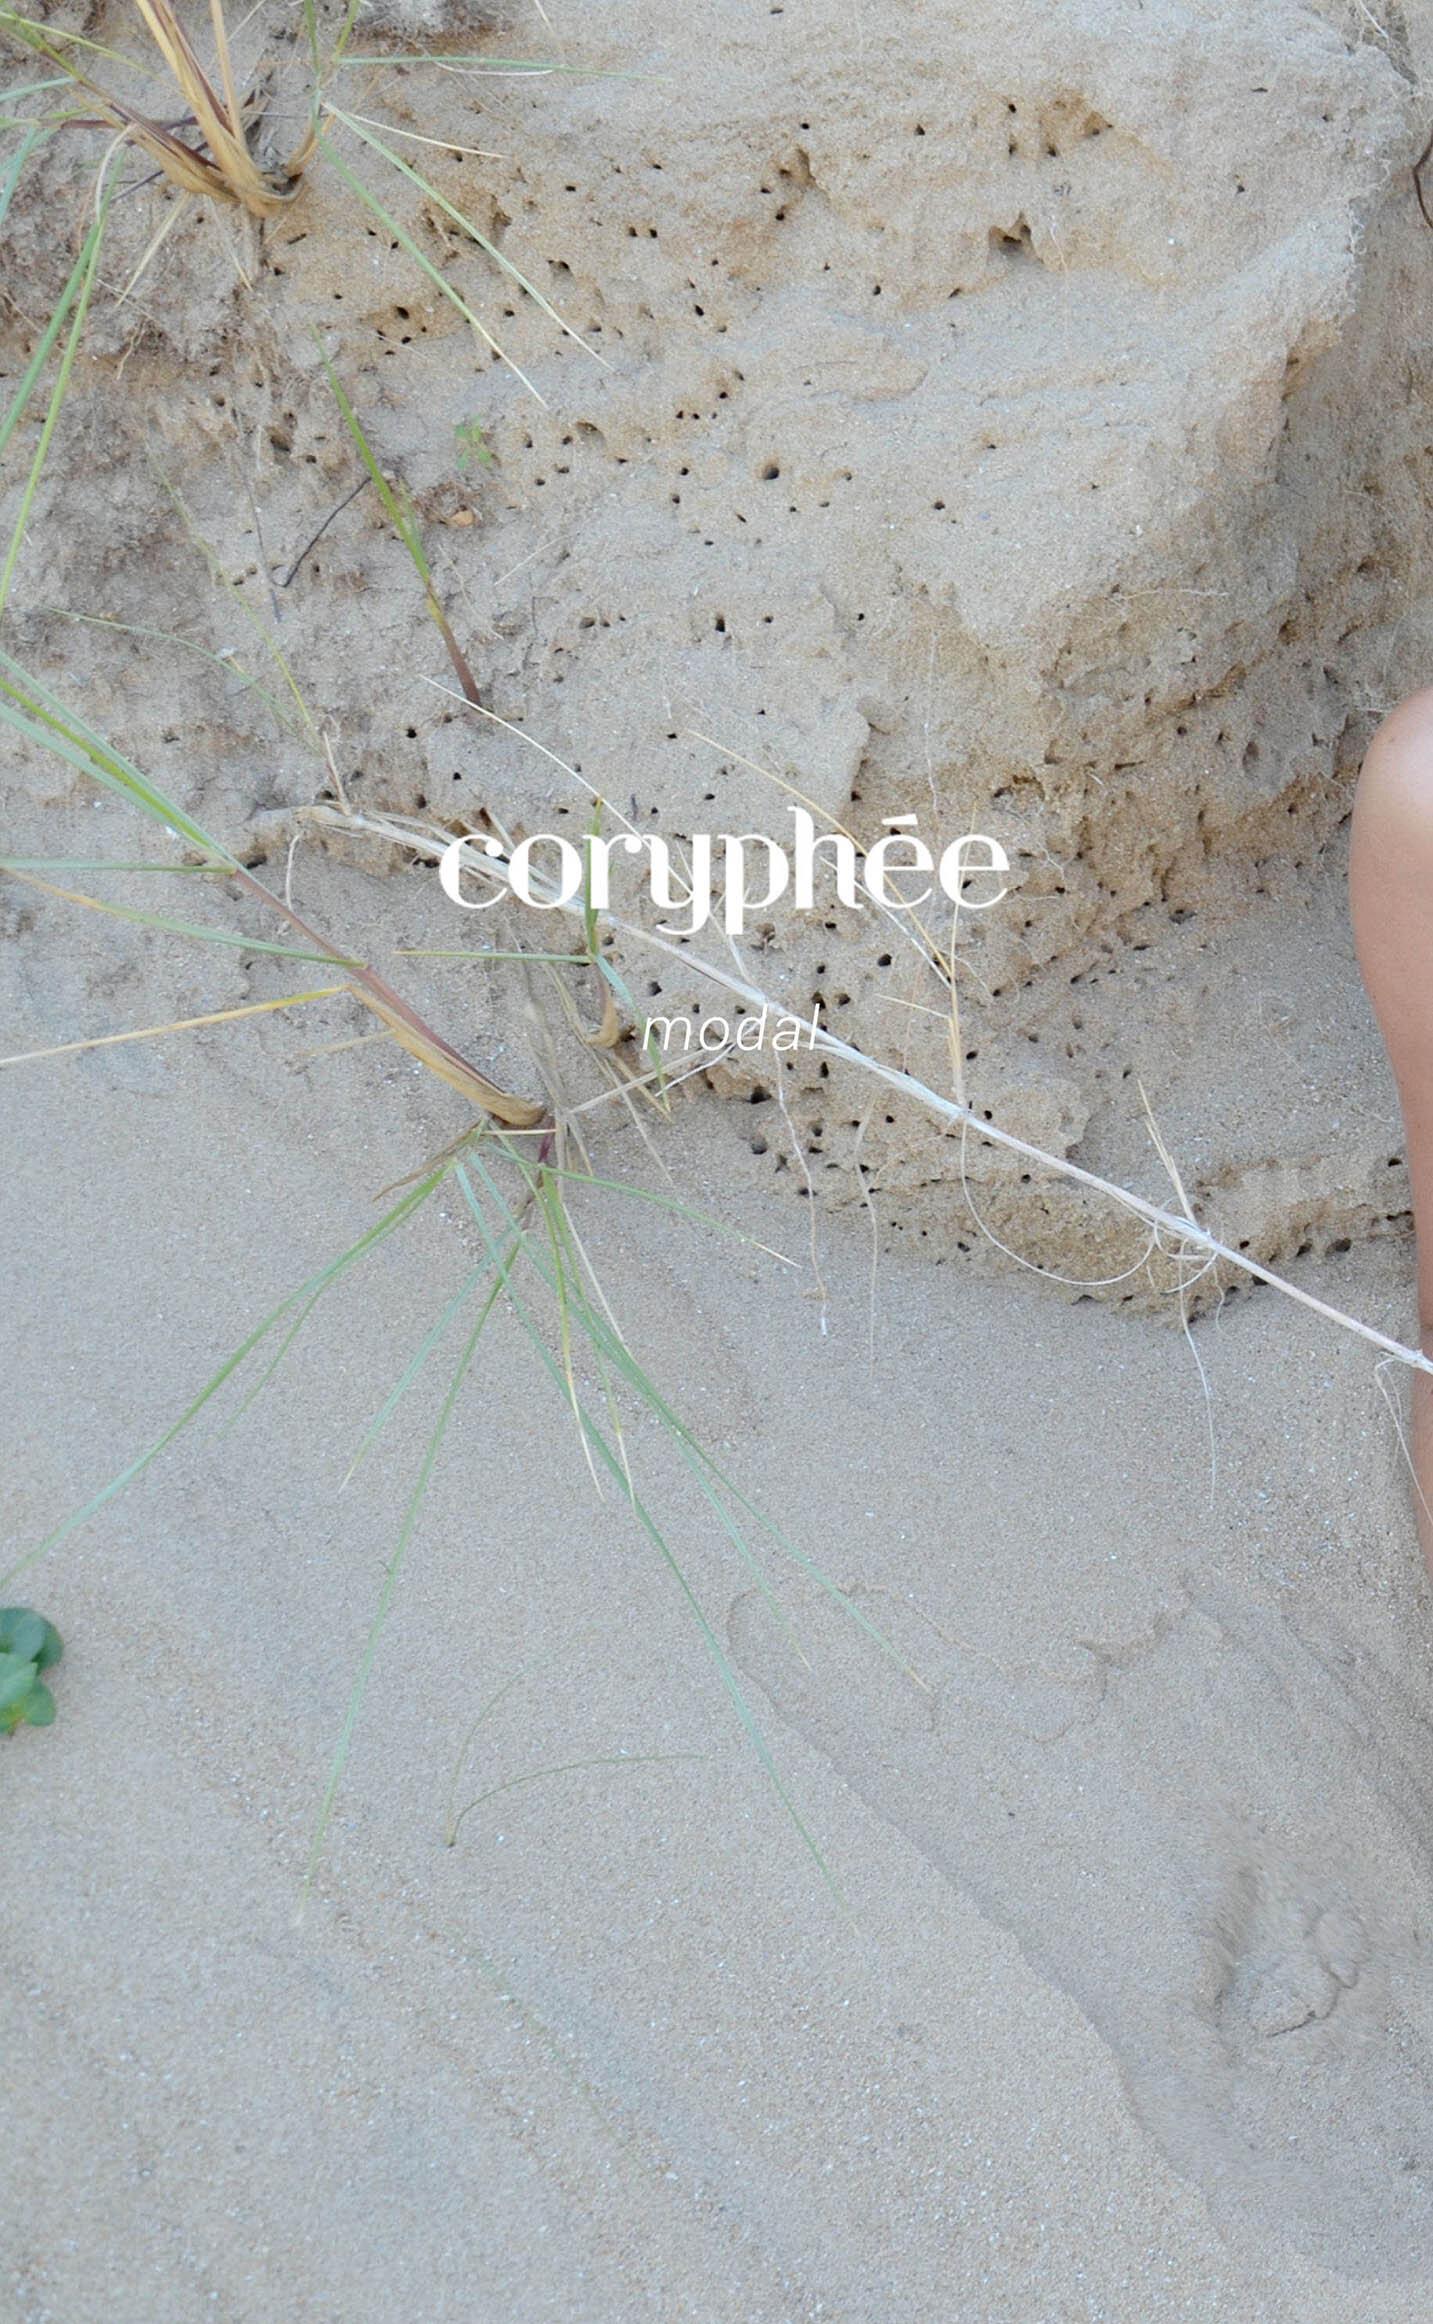 HESTIA FOULARD MARINE FACE part 1 modal.jpg